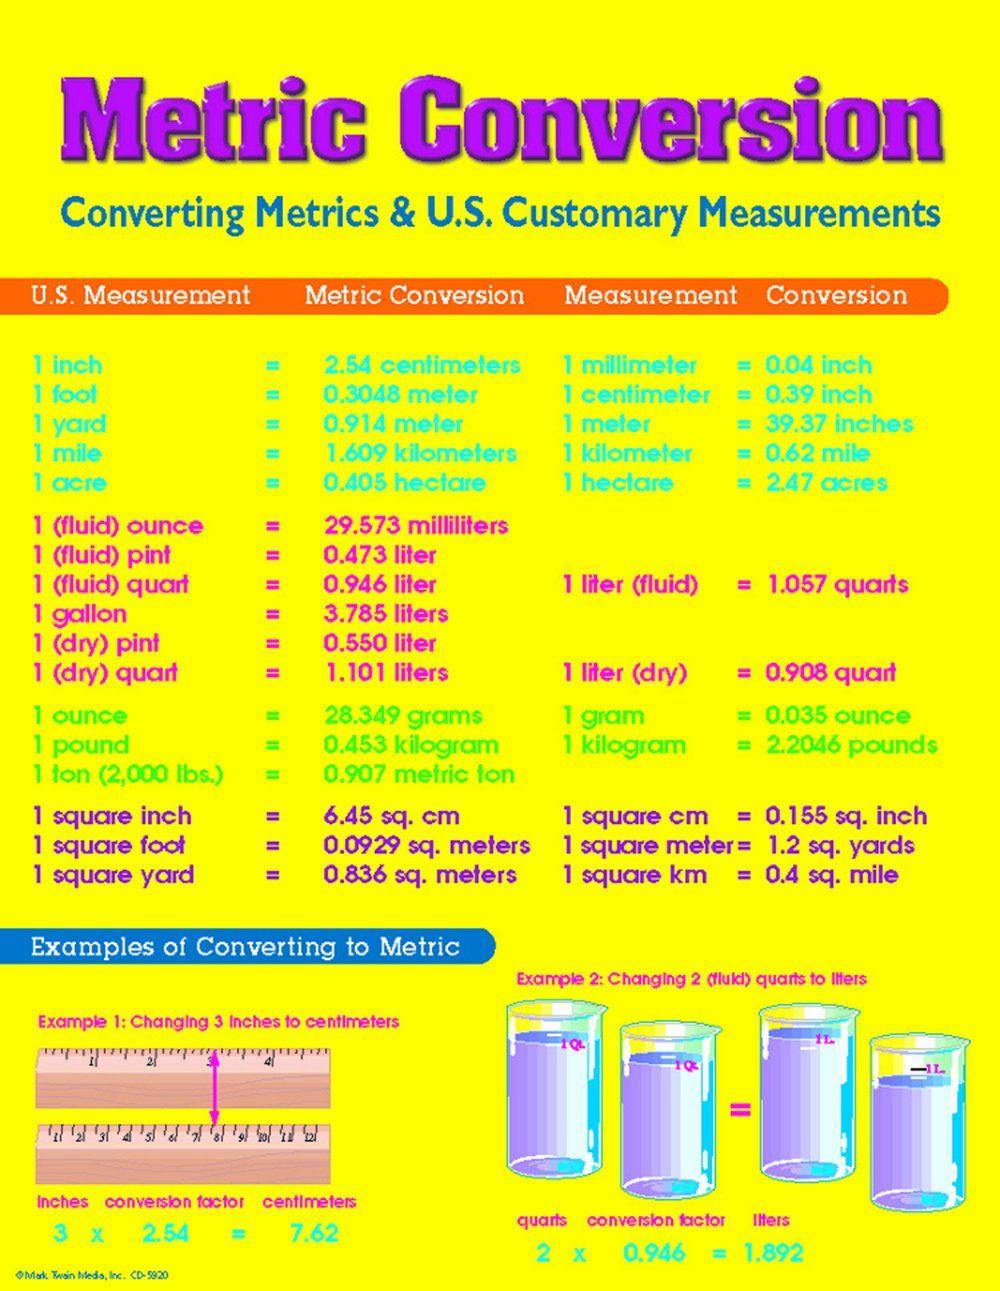 71wvpvqxjwlsl1291g 10001291 measurements pinterest chart metric conversion by carson dellosa nvjuhfo Choice Image